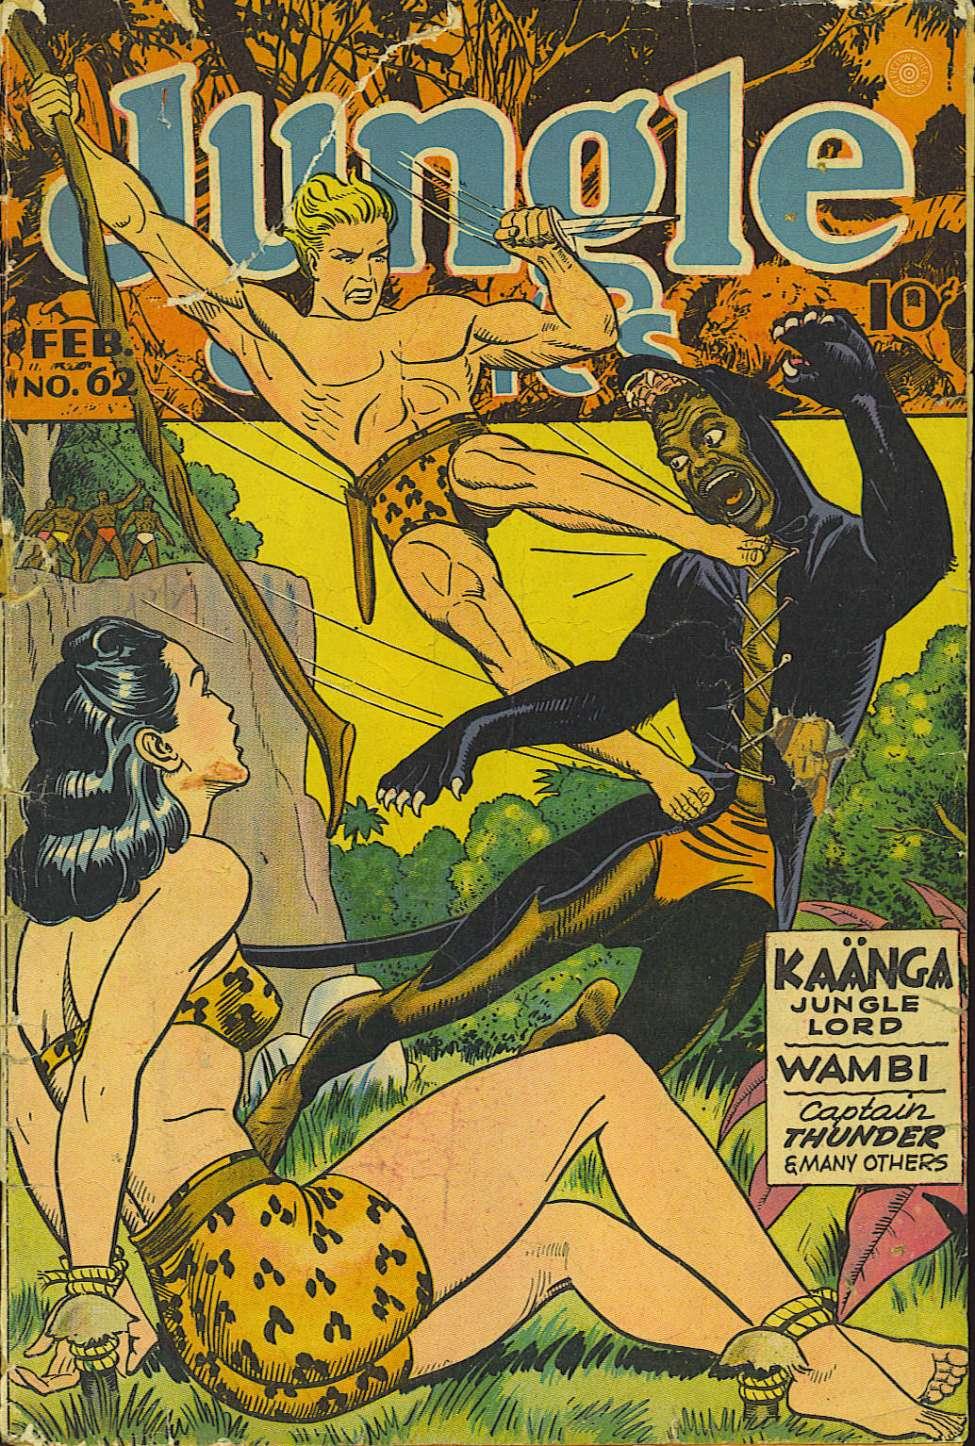 Comic Book Cover For Jungle Comics #62